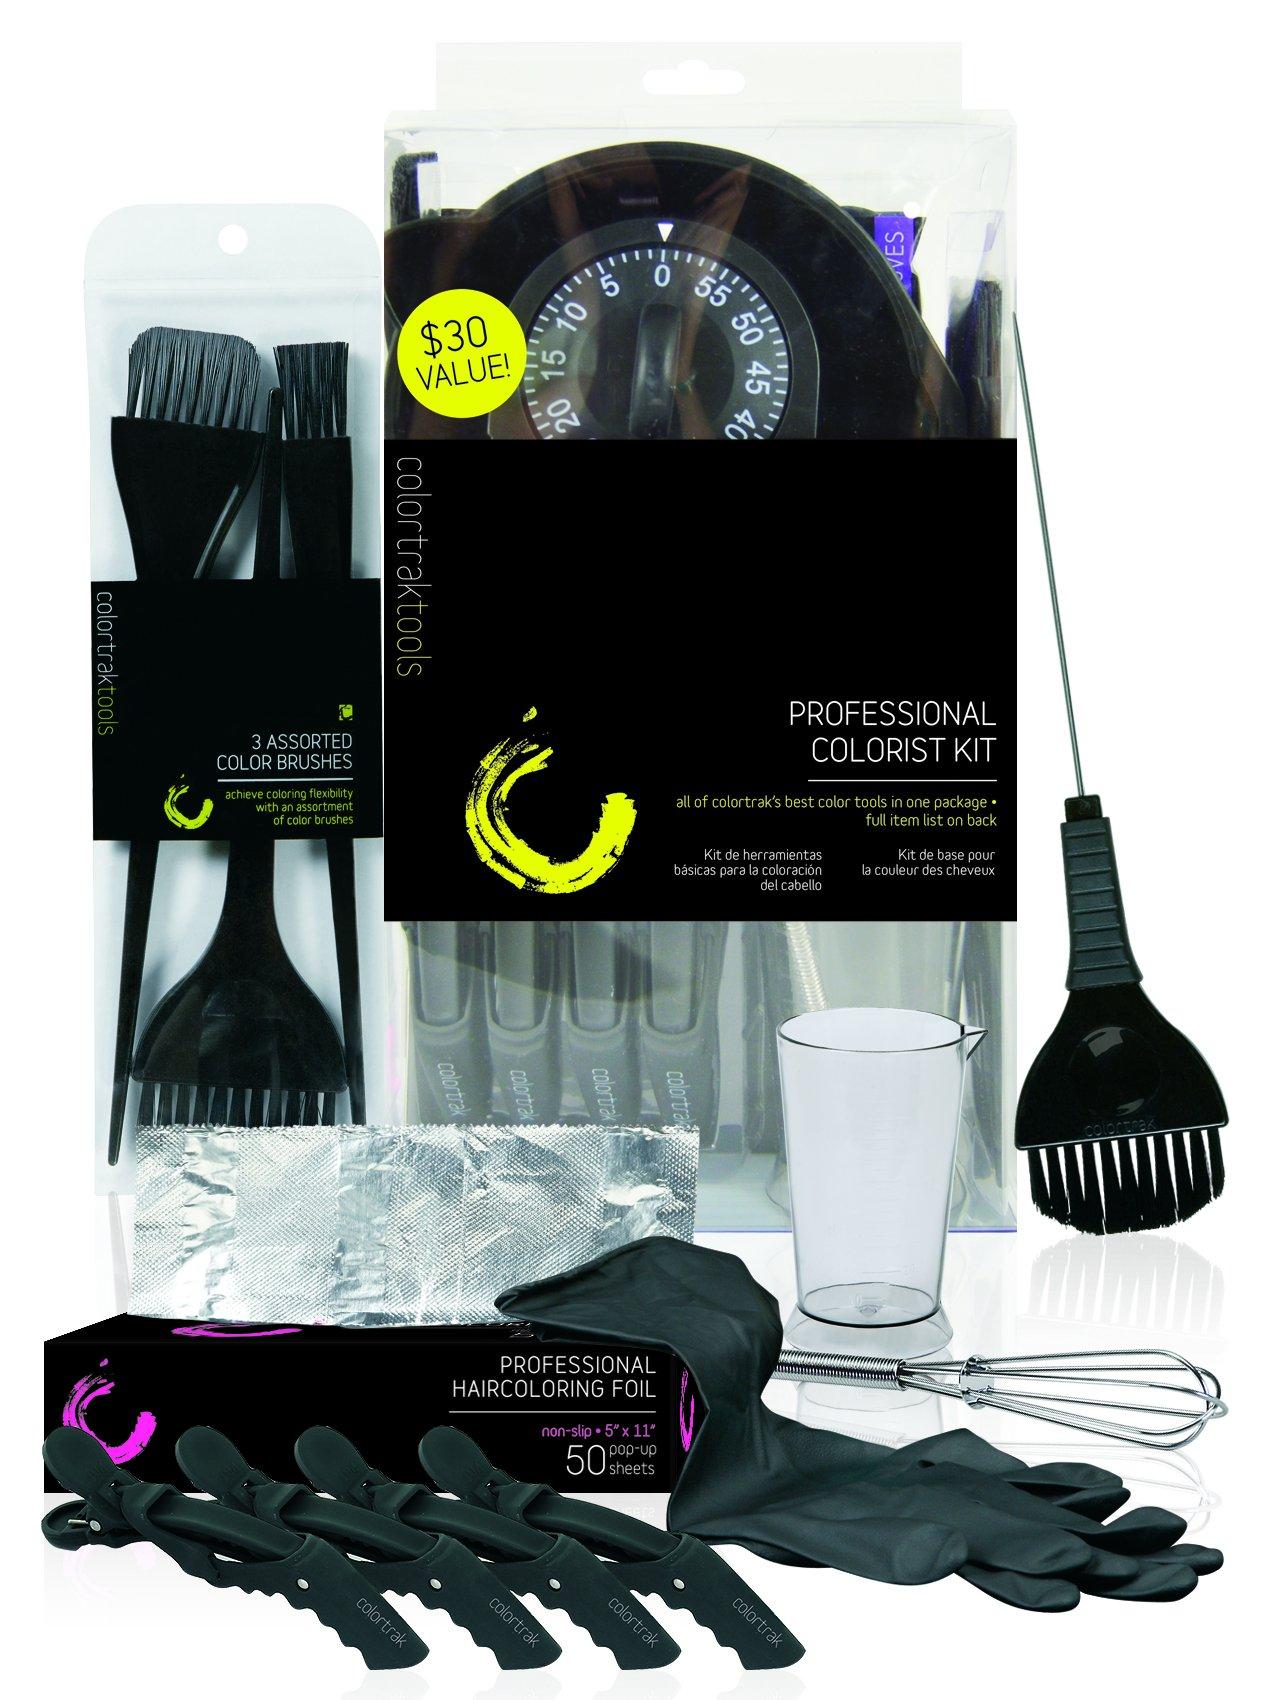 ColorTrak Professional Hair Colorist Kit by Colortrak